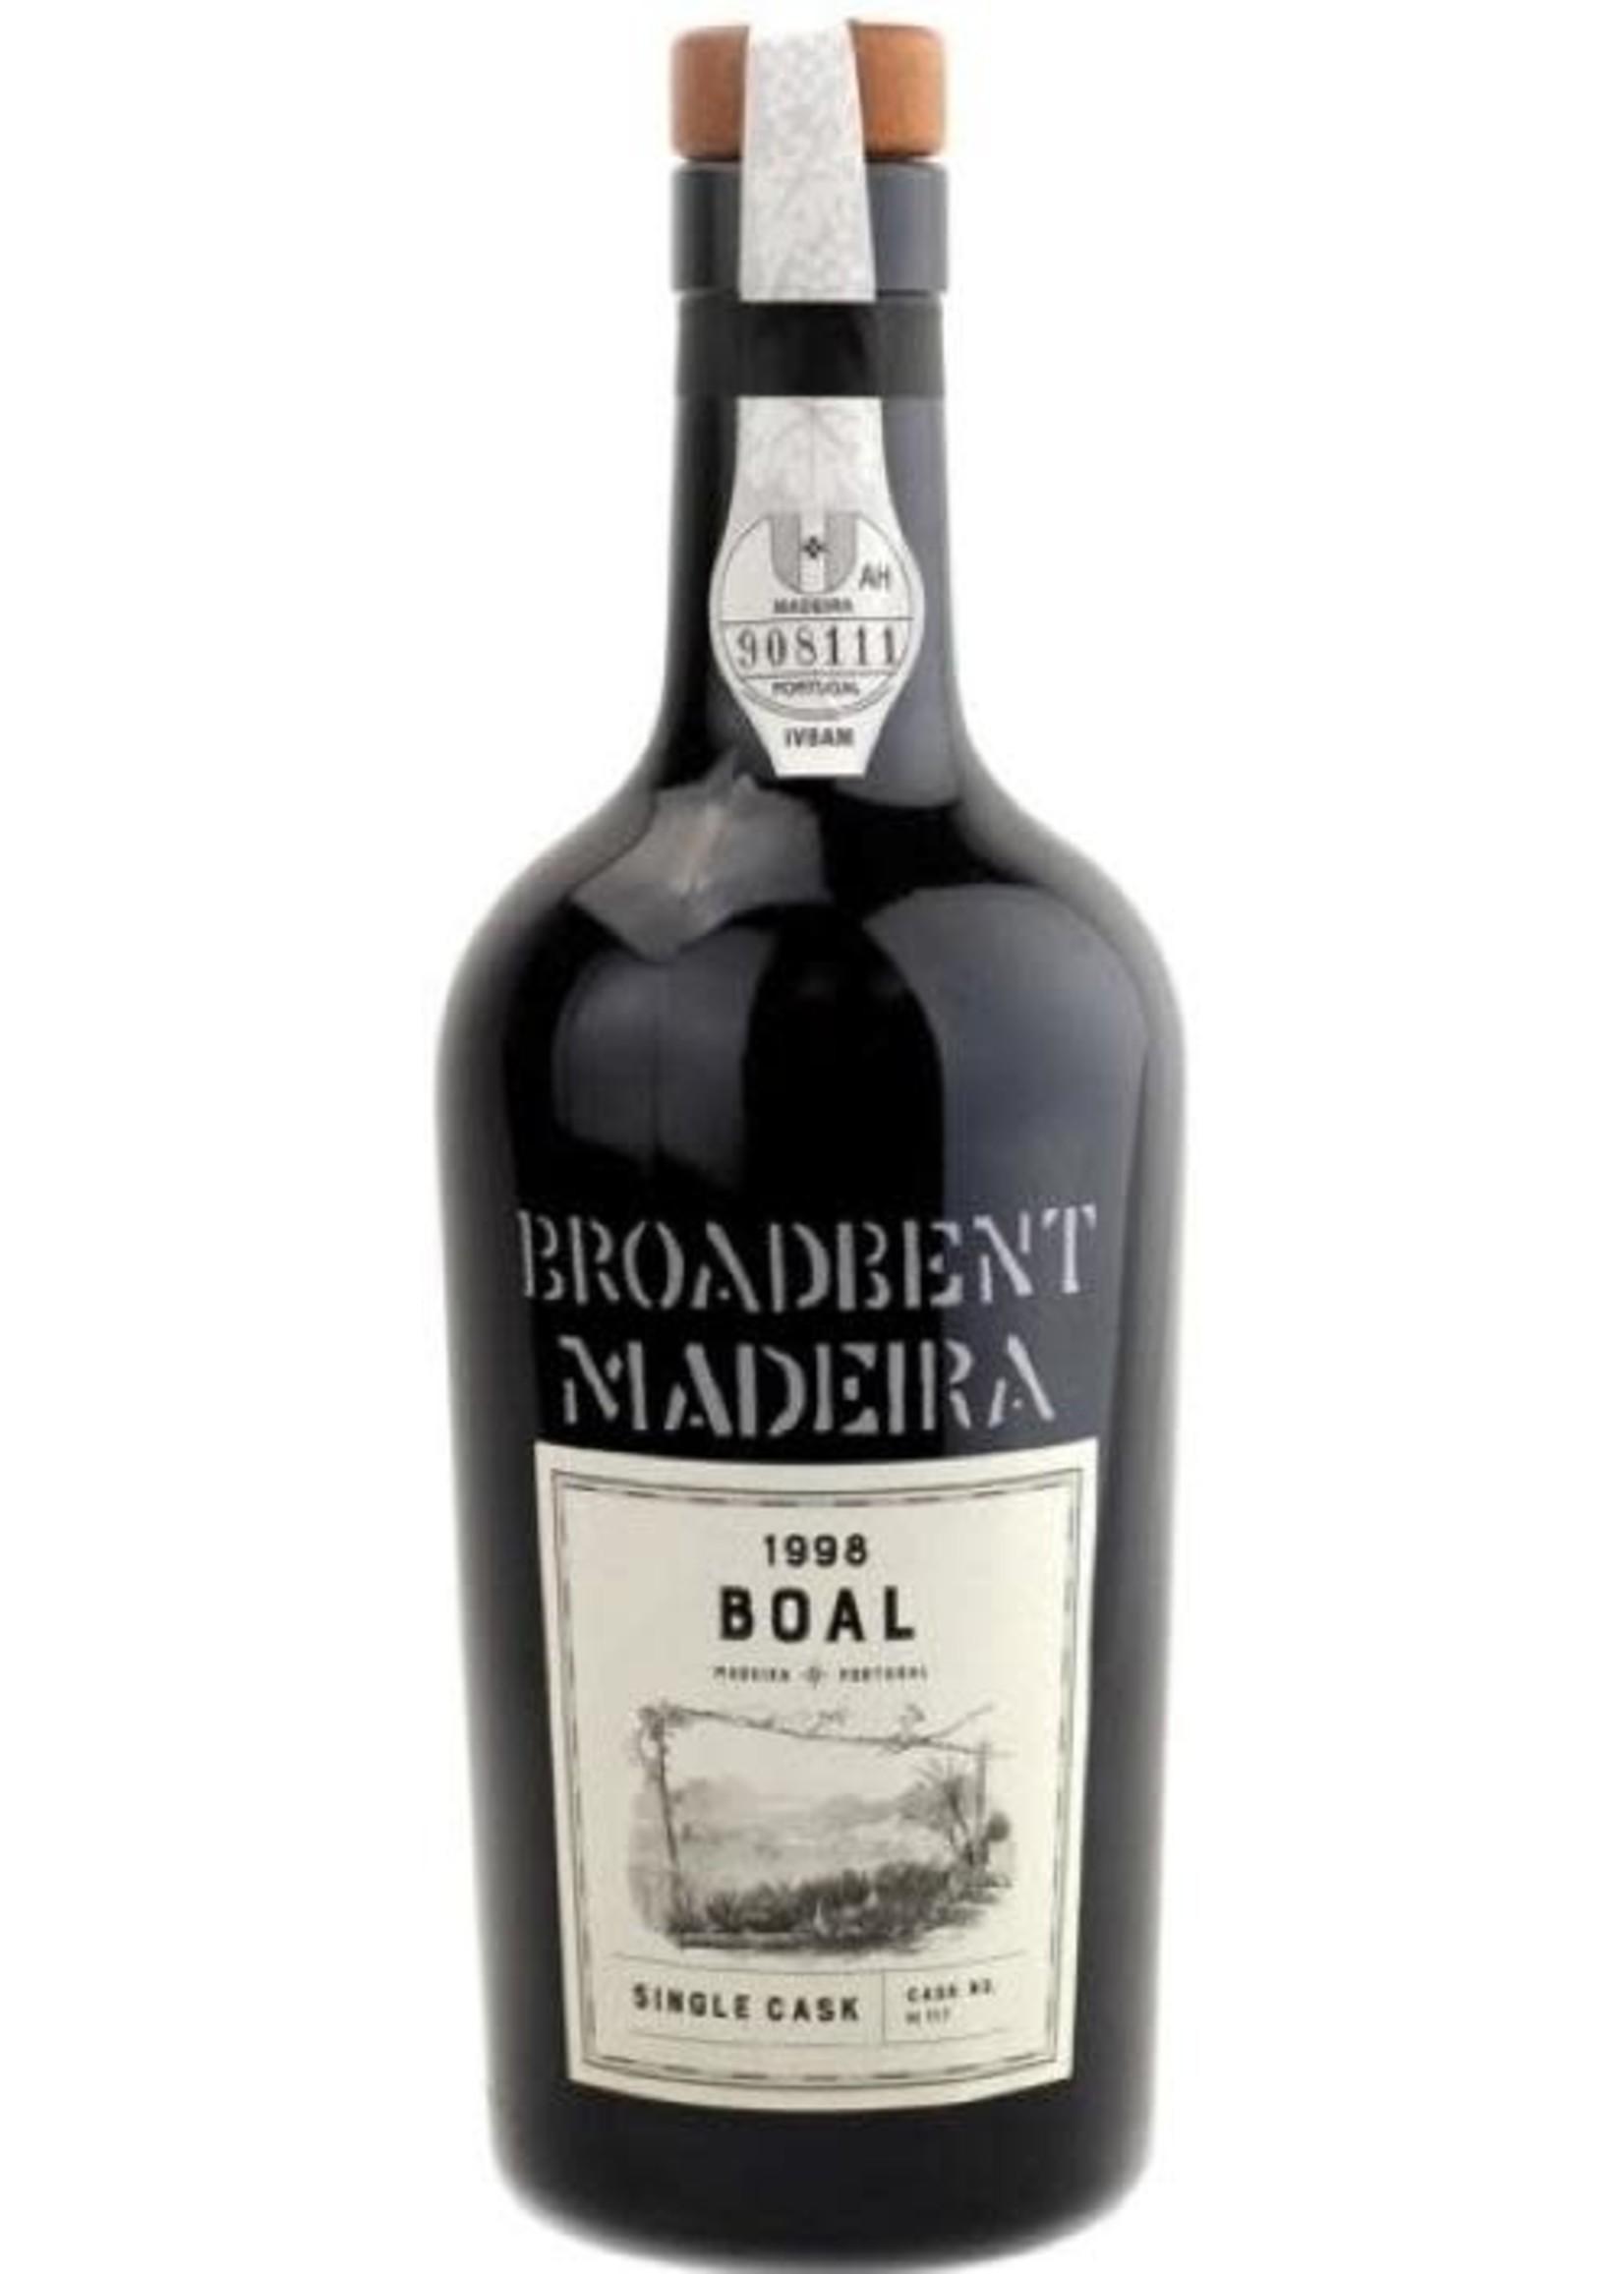 Broadbent Broadbent / Single Cask Boal Madeira Cask No. 117 1998 / 500mL